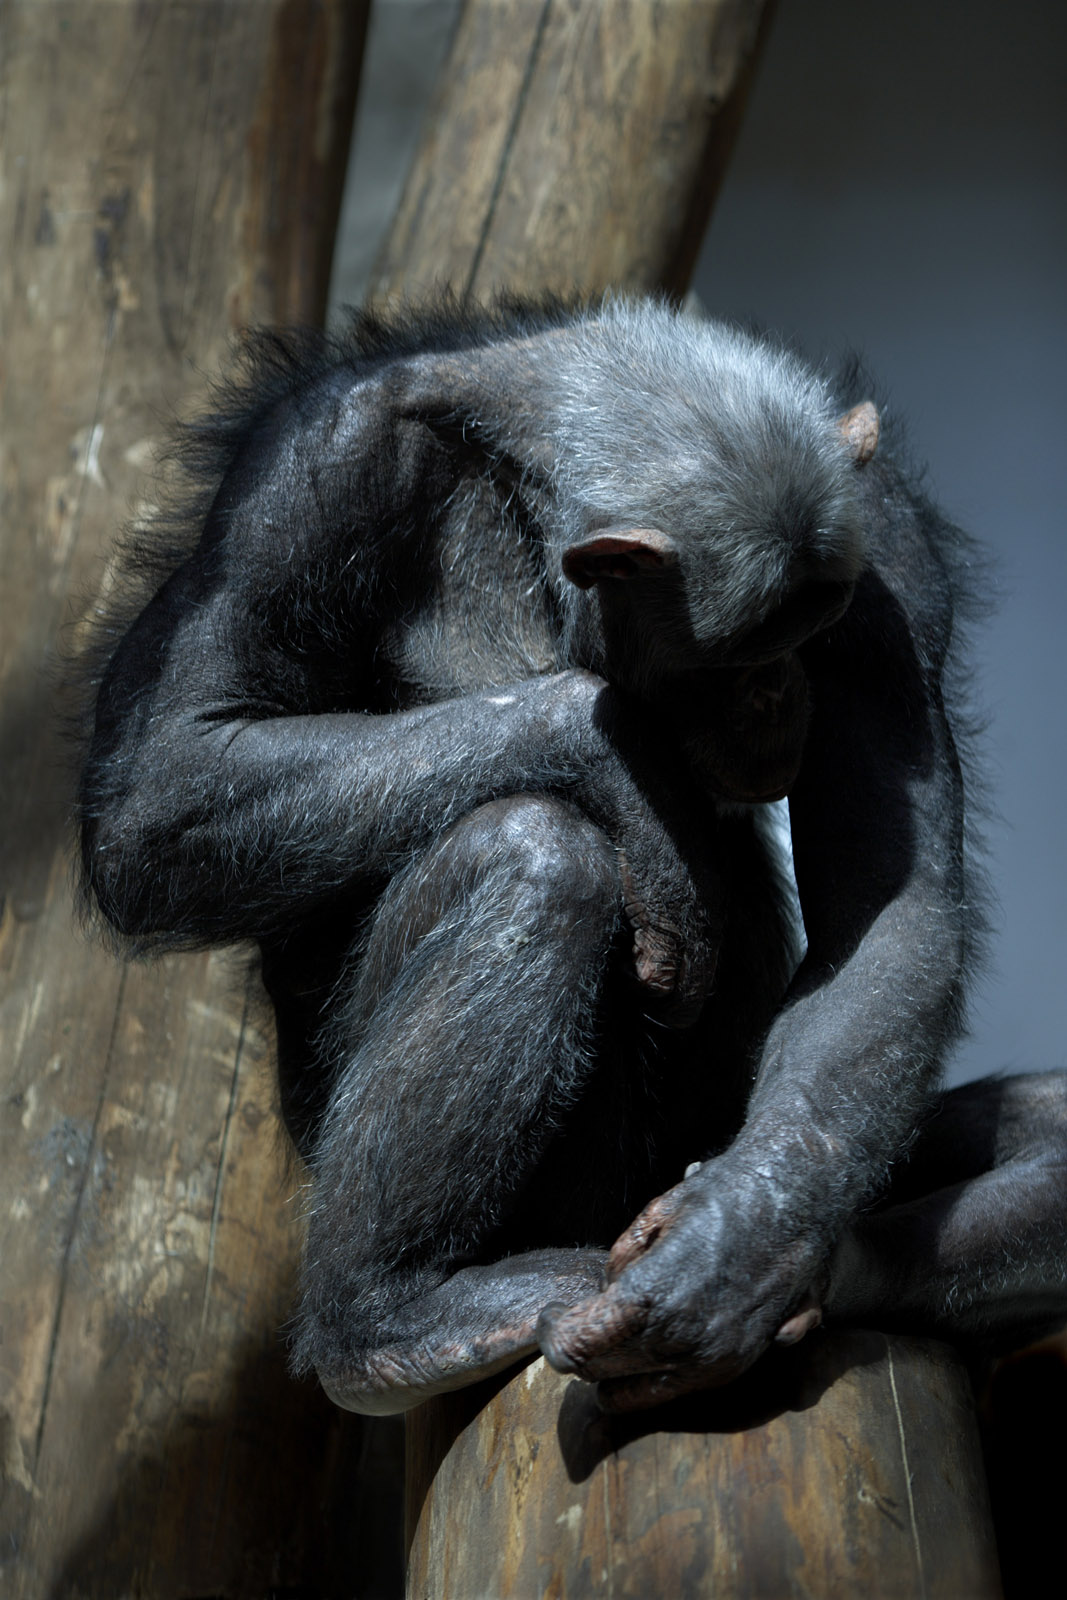 monkey-like, 2010, archival inkjet print mounted on aluminum, 93,3 x 61,3 cm, ed. 5 + AP